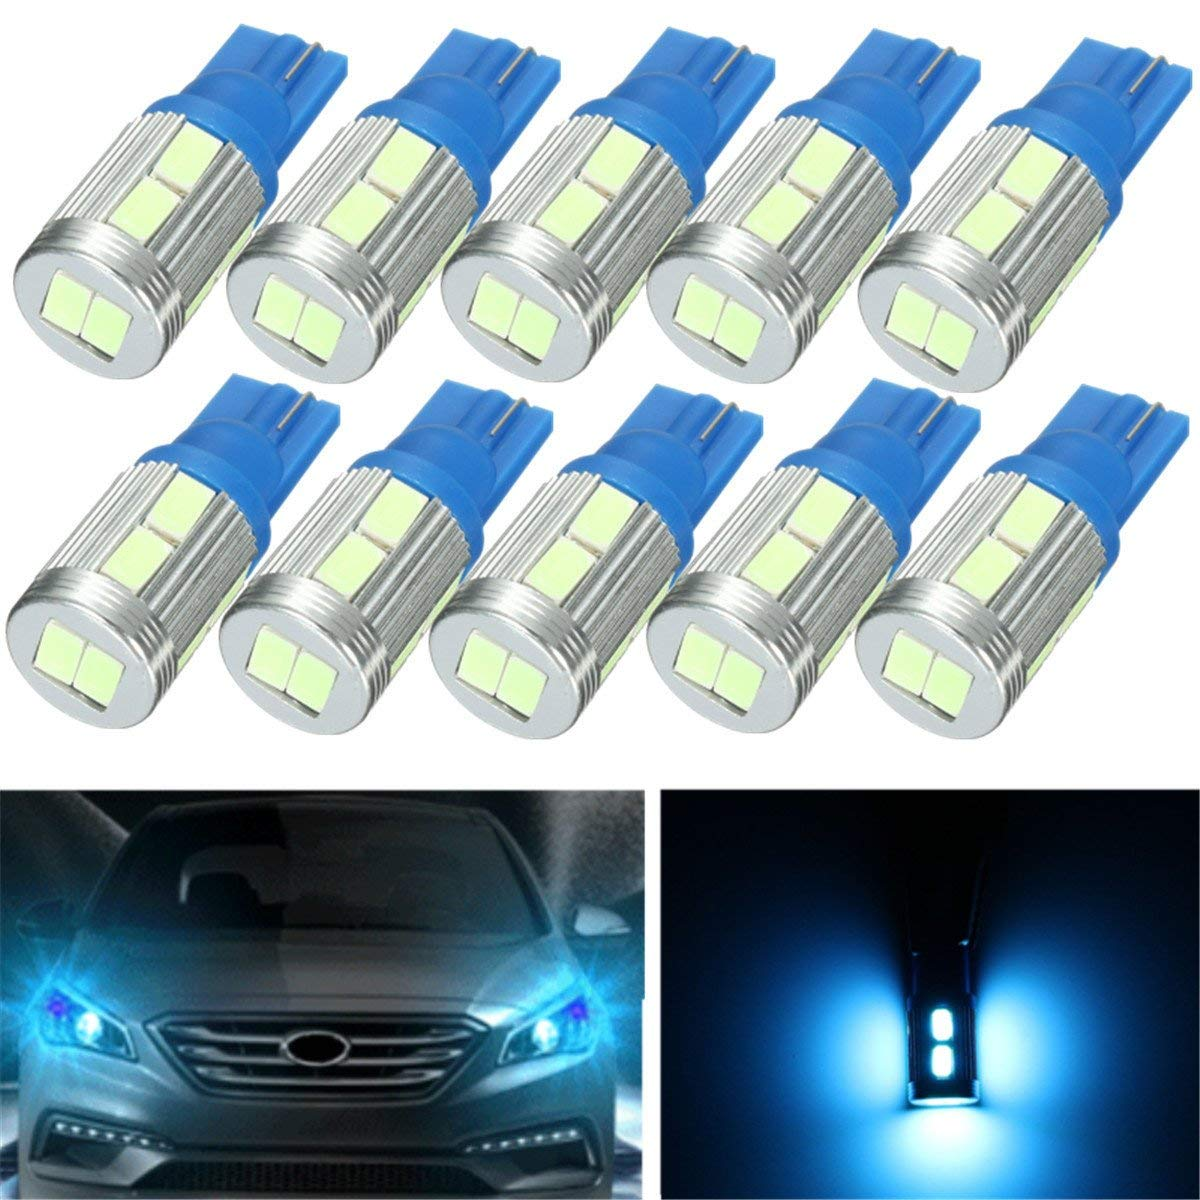 Fincos 10Pcs Ice Blue 20Lm 2.3W 0.17A T10 5730 LED Side Indicator Lamp Light